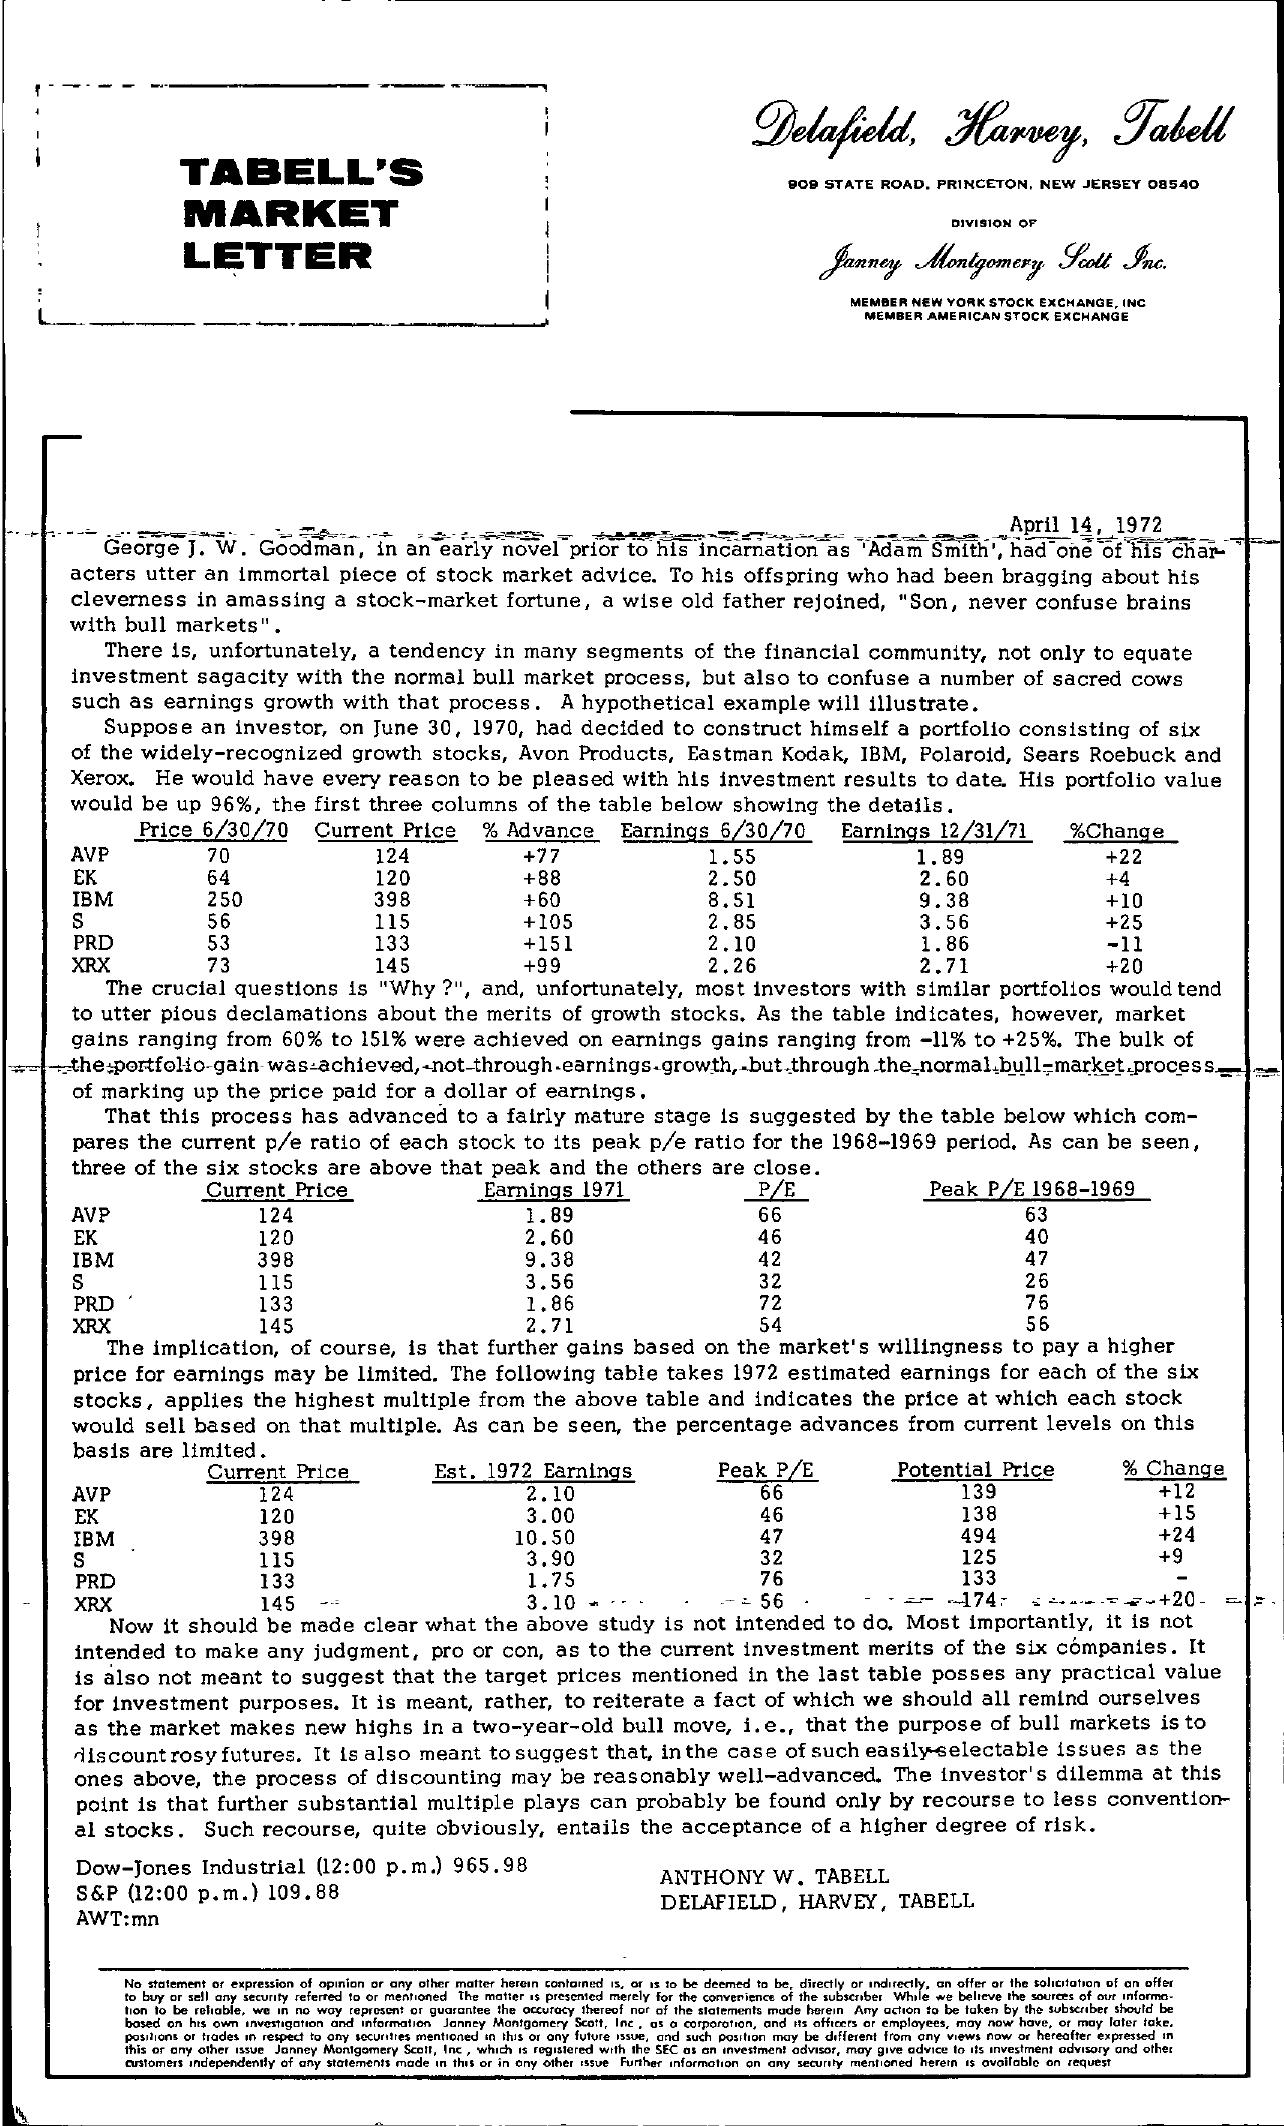 Tabell's Market Letter - April 14, 1972